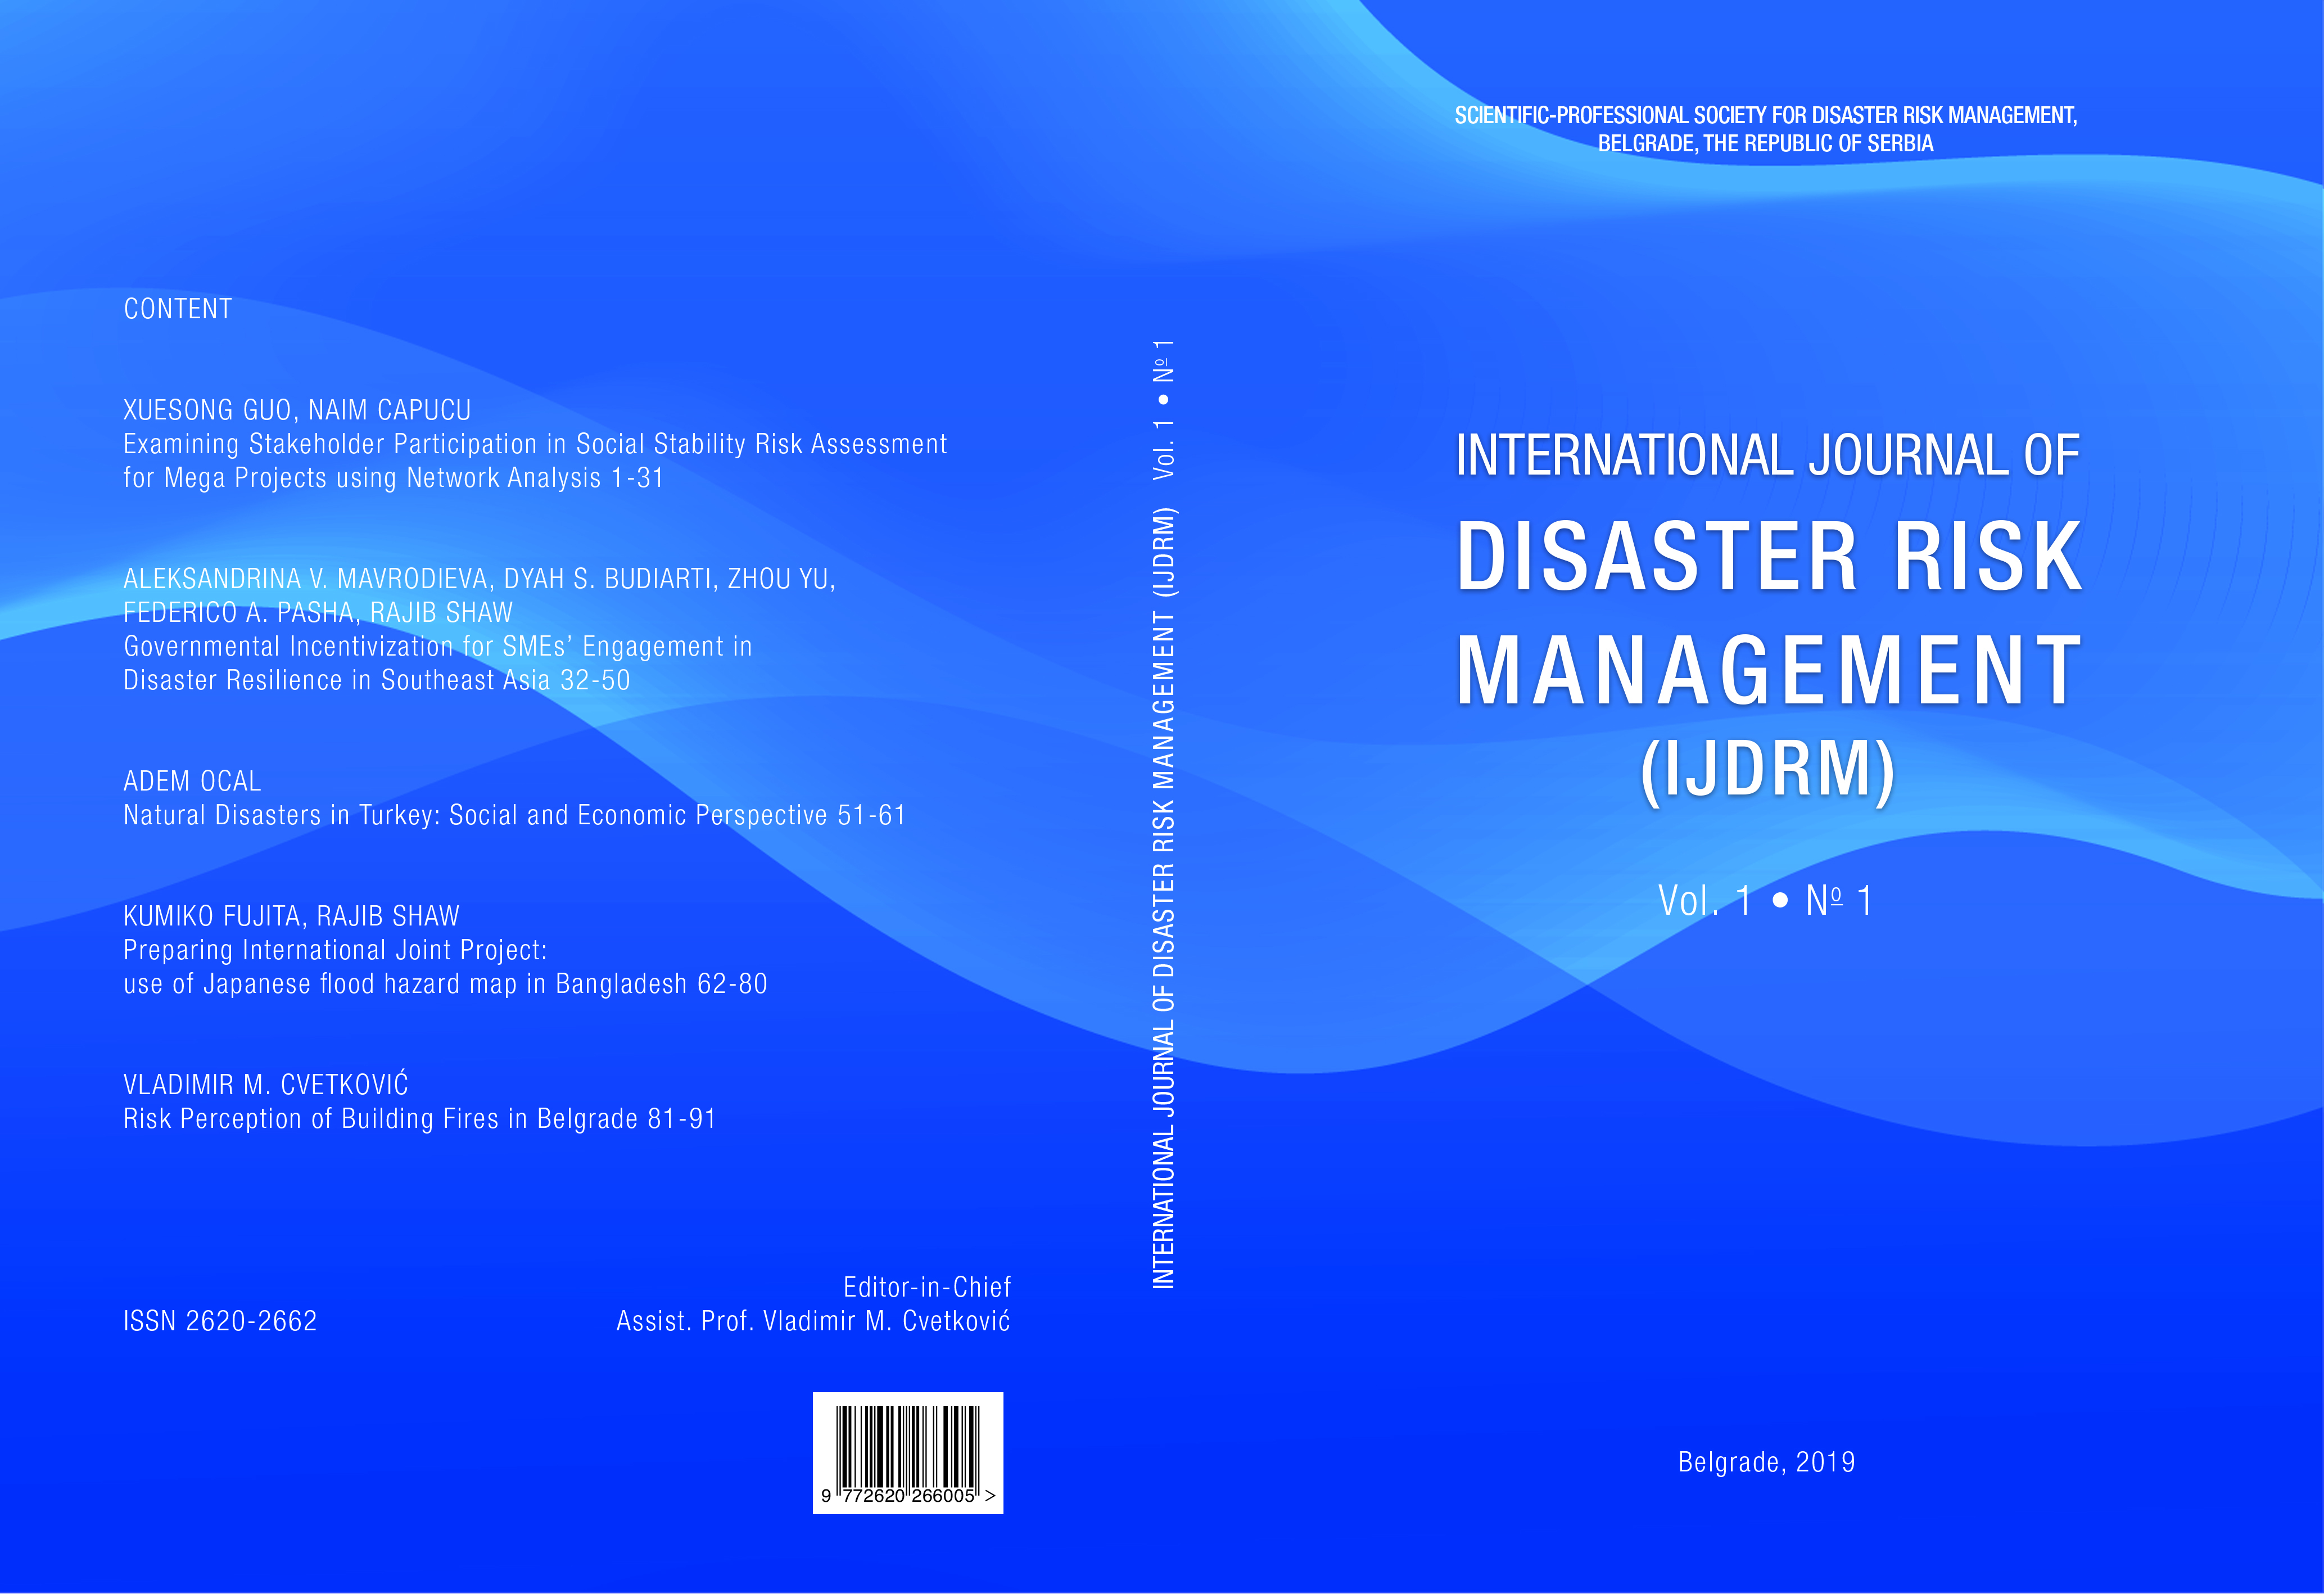 International Journal of Disaster Risk Management (IJDRM)